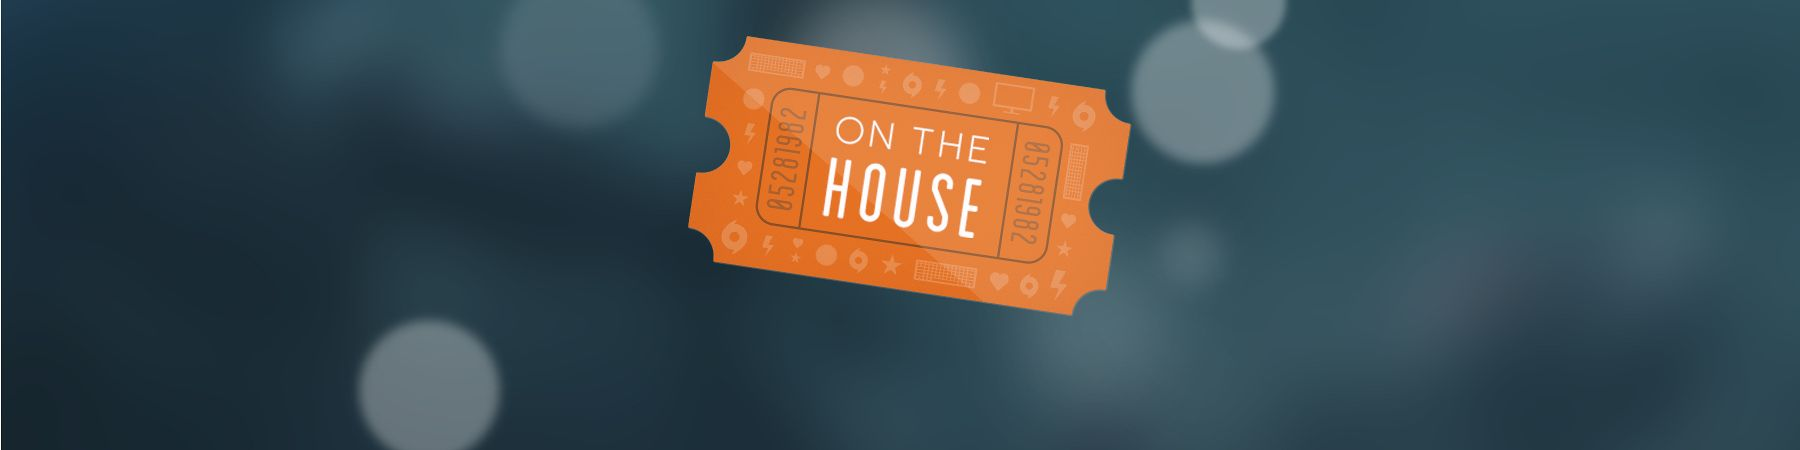 origin on the house